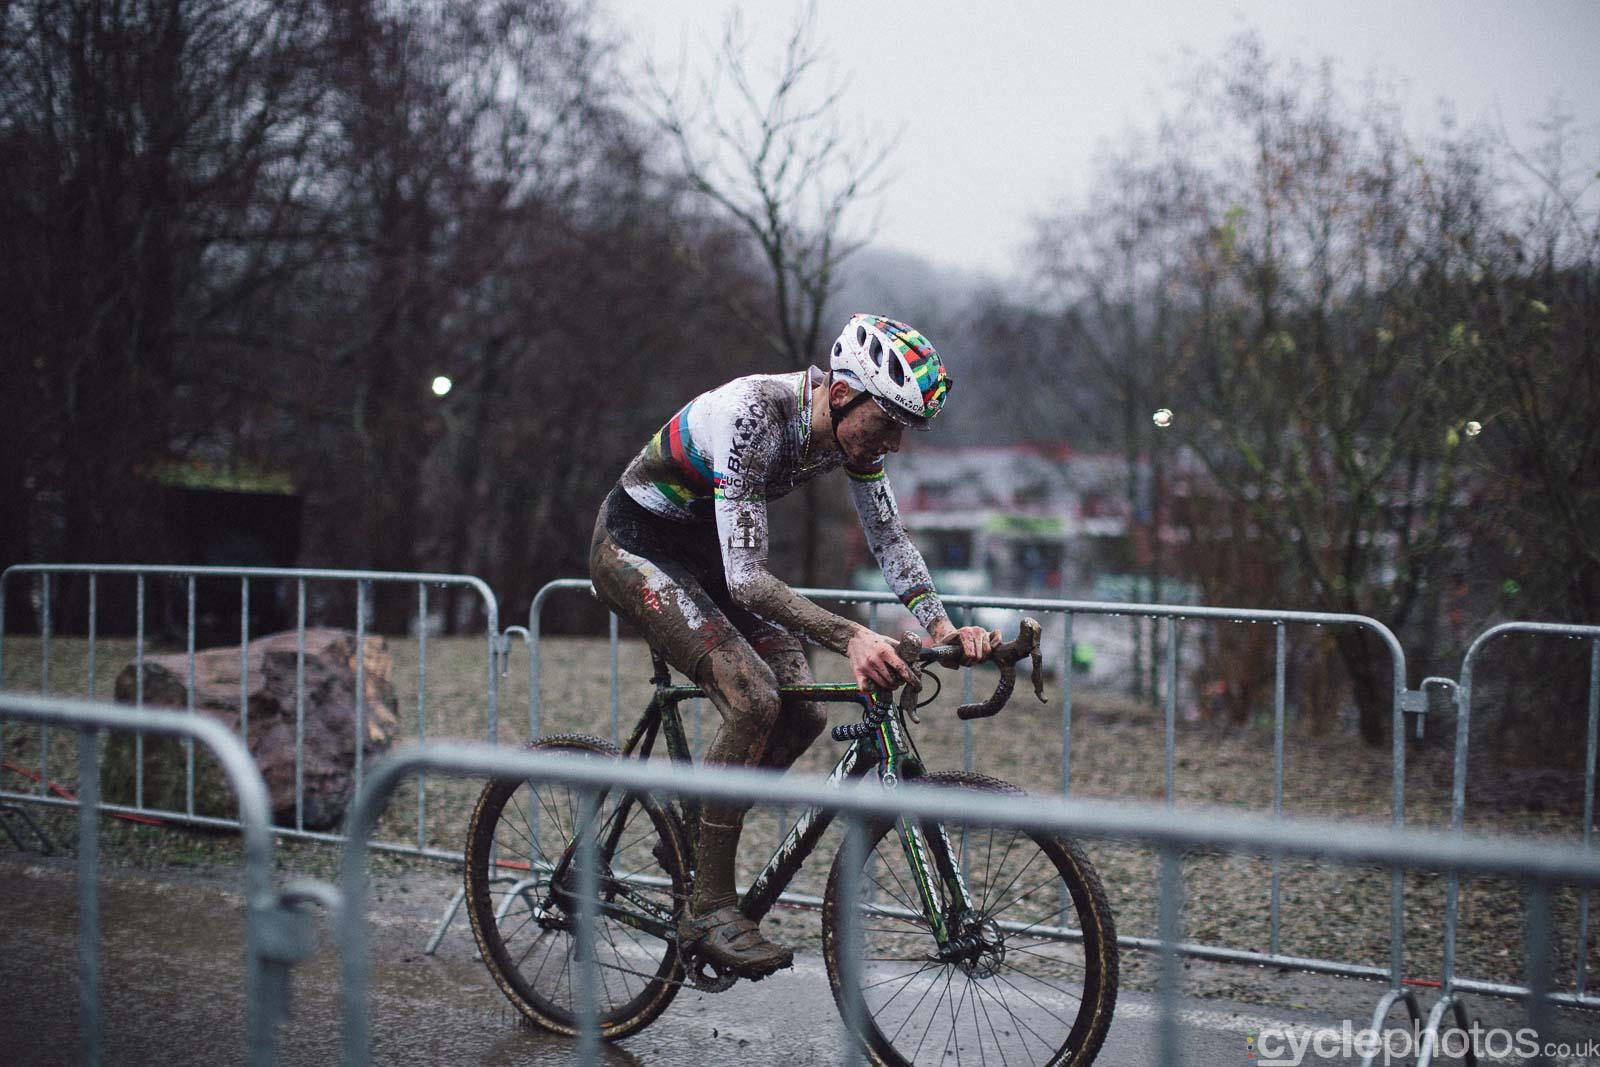 2015-cyclephotos-cyclocross-spa-153541-mathieu-van-der-poel